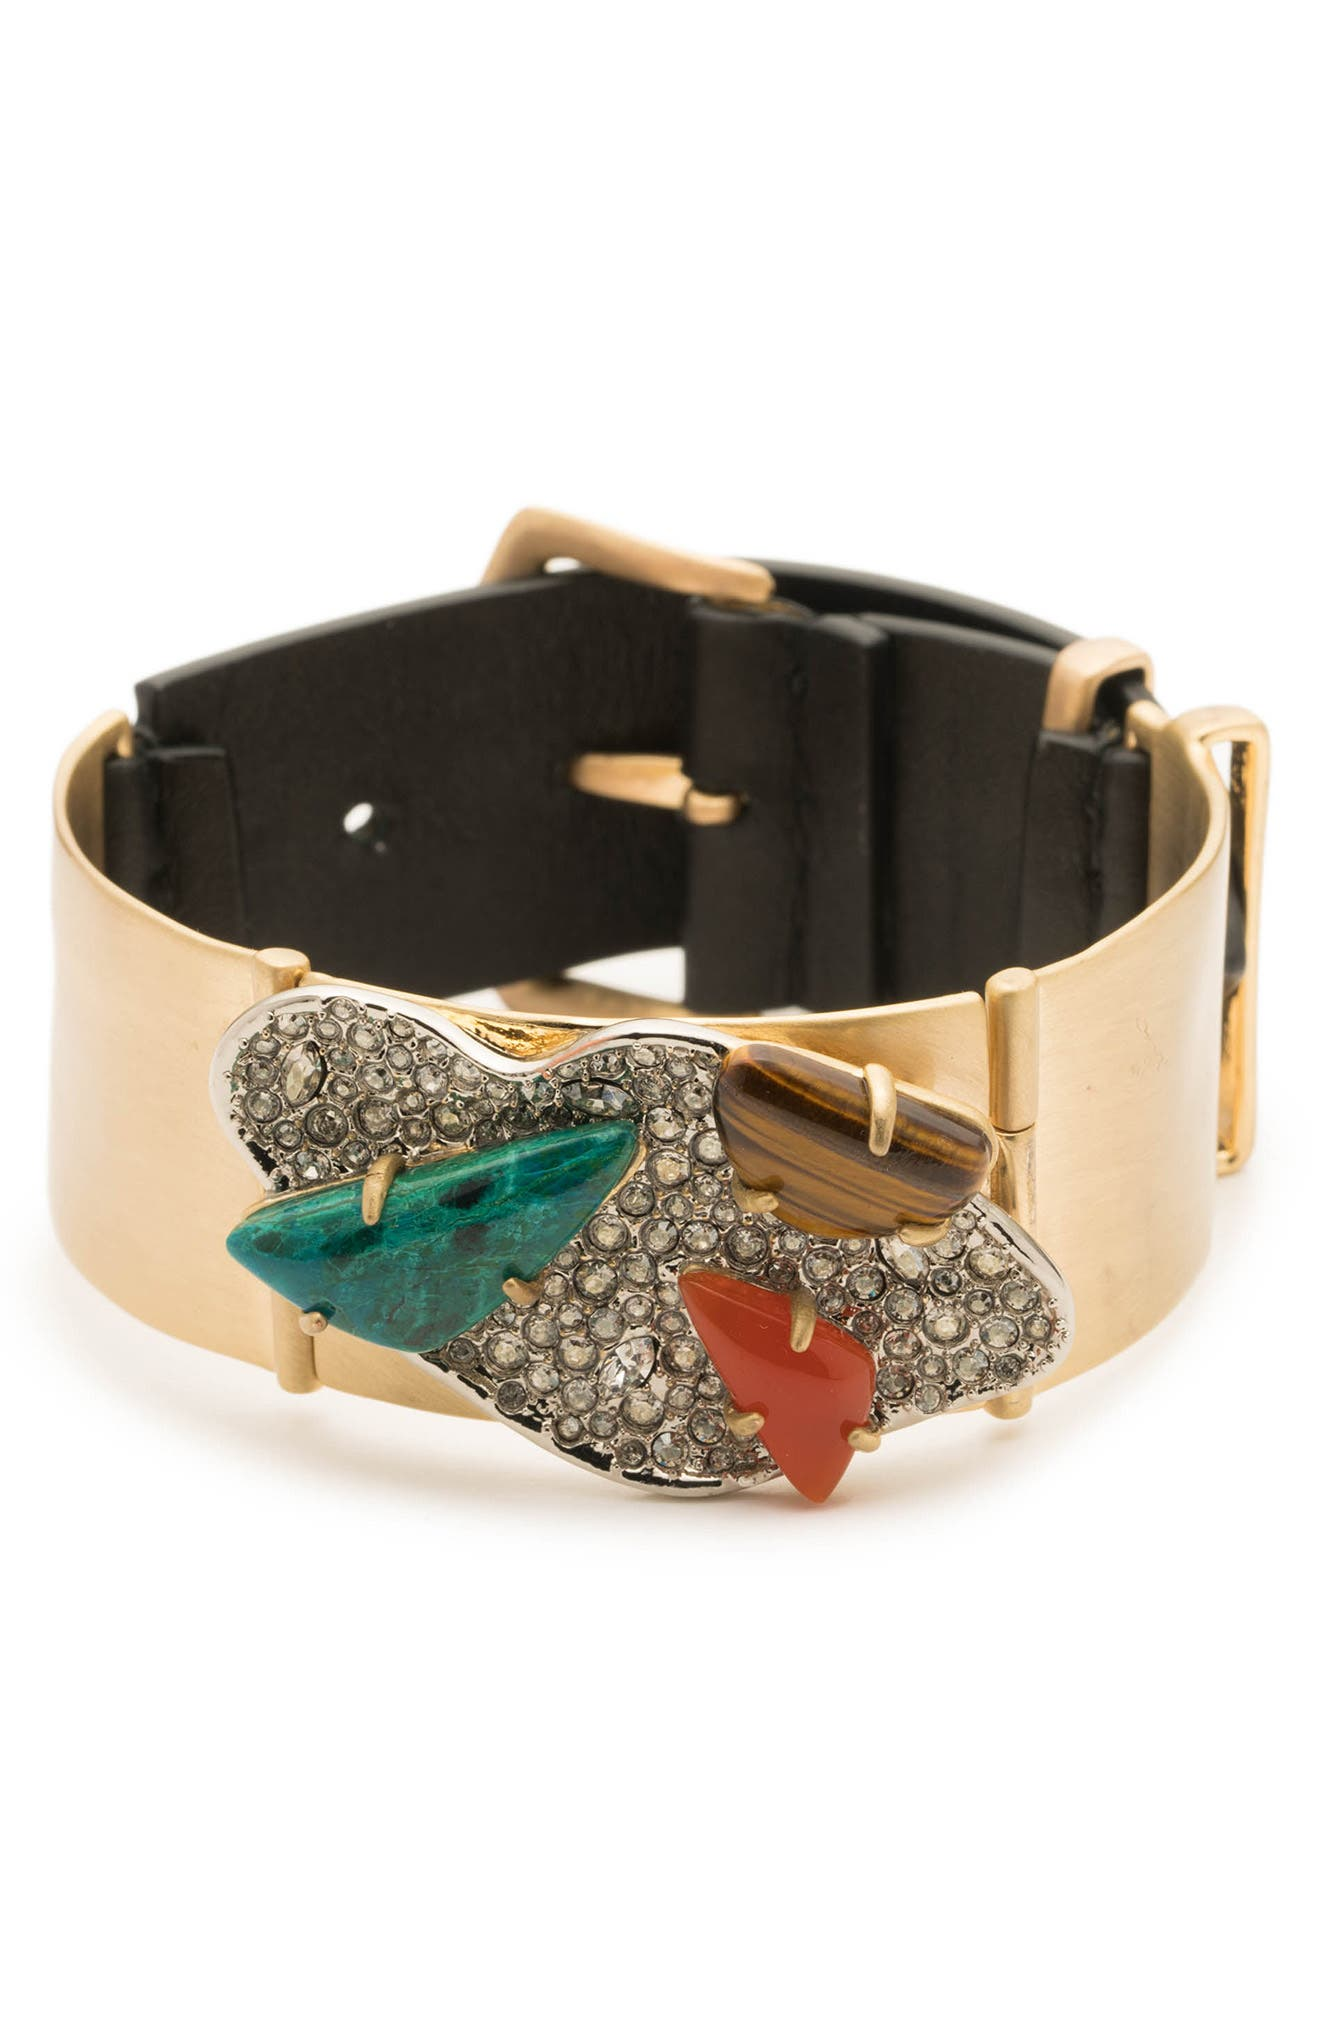 Alexis Bittar Crystal Encrusted Leather Strap Bracelet